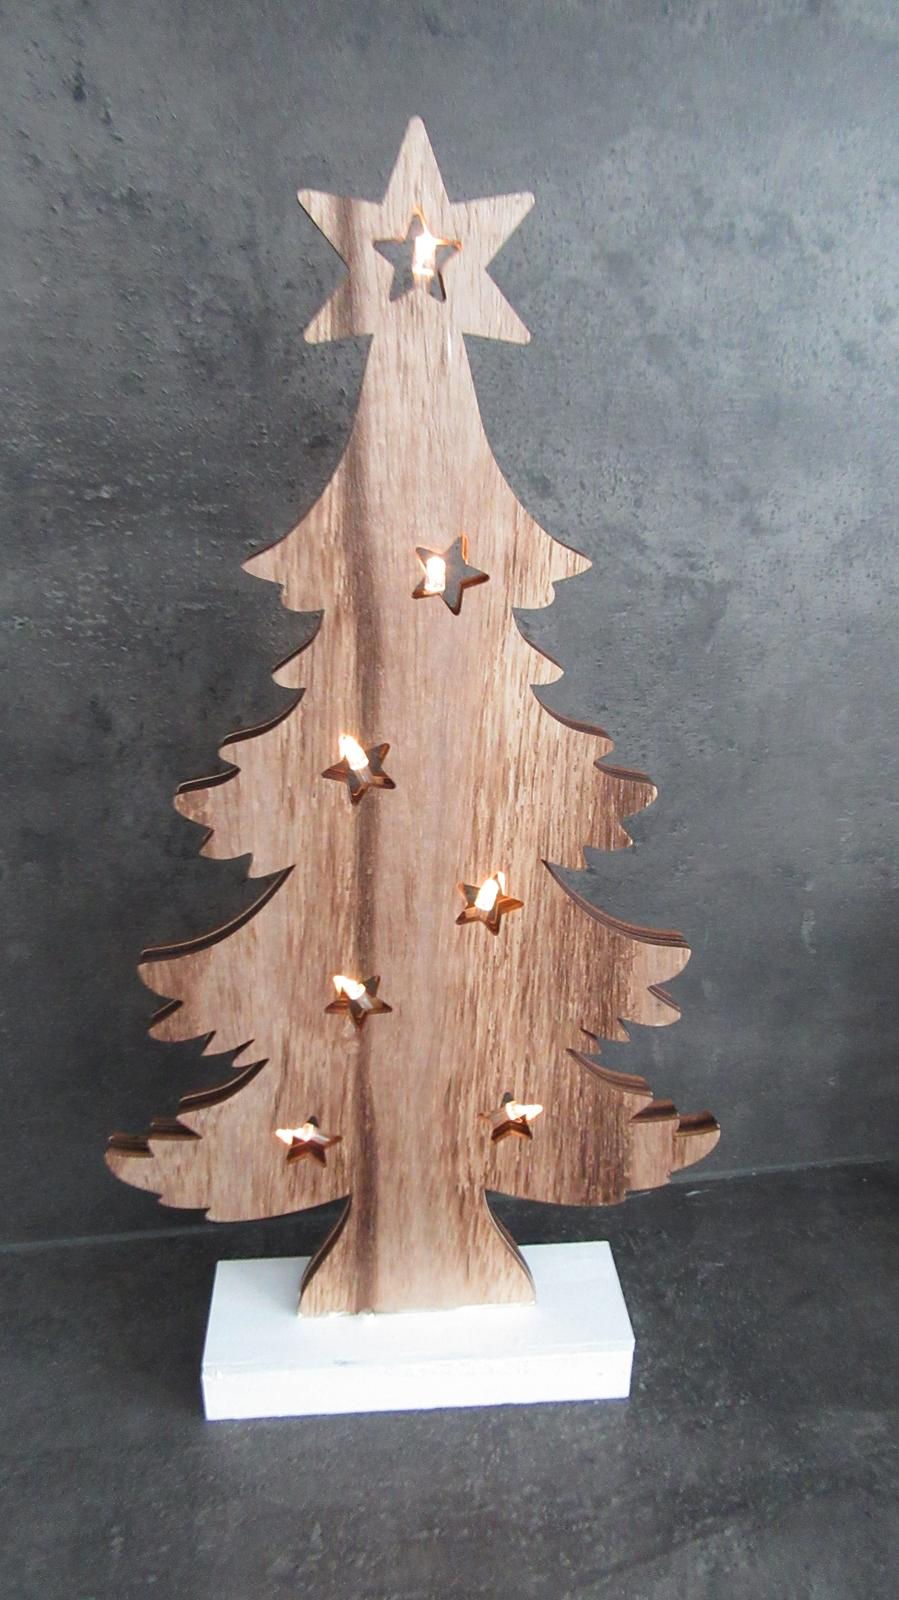 drevený stromček s LED svetielkami - Obrázok č. 2